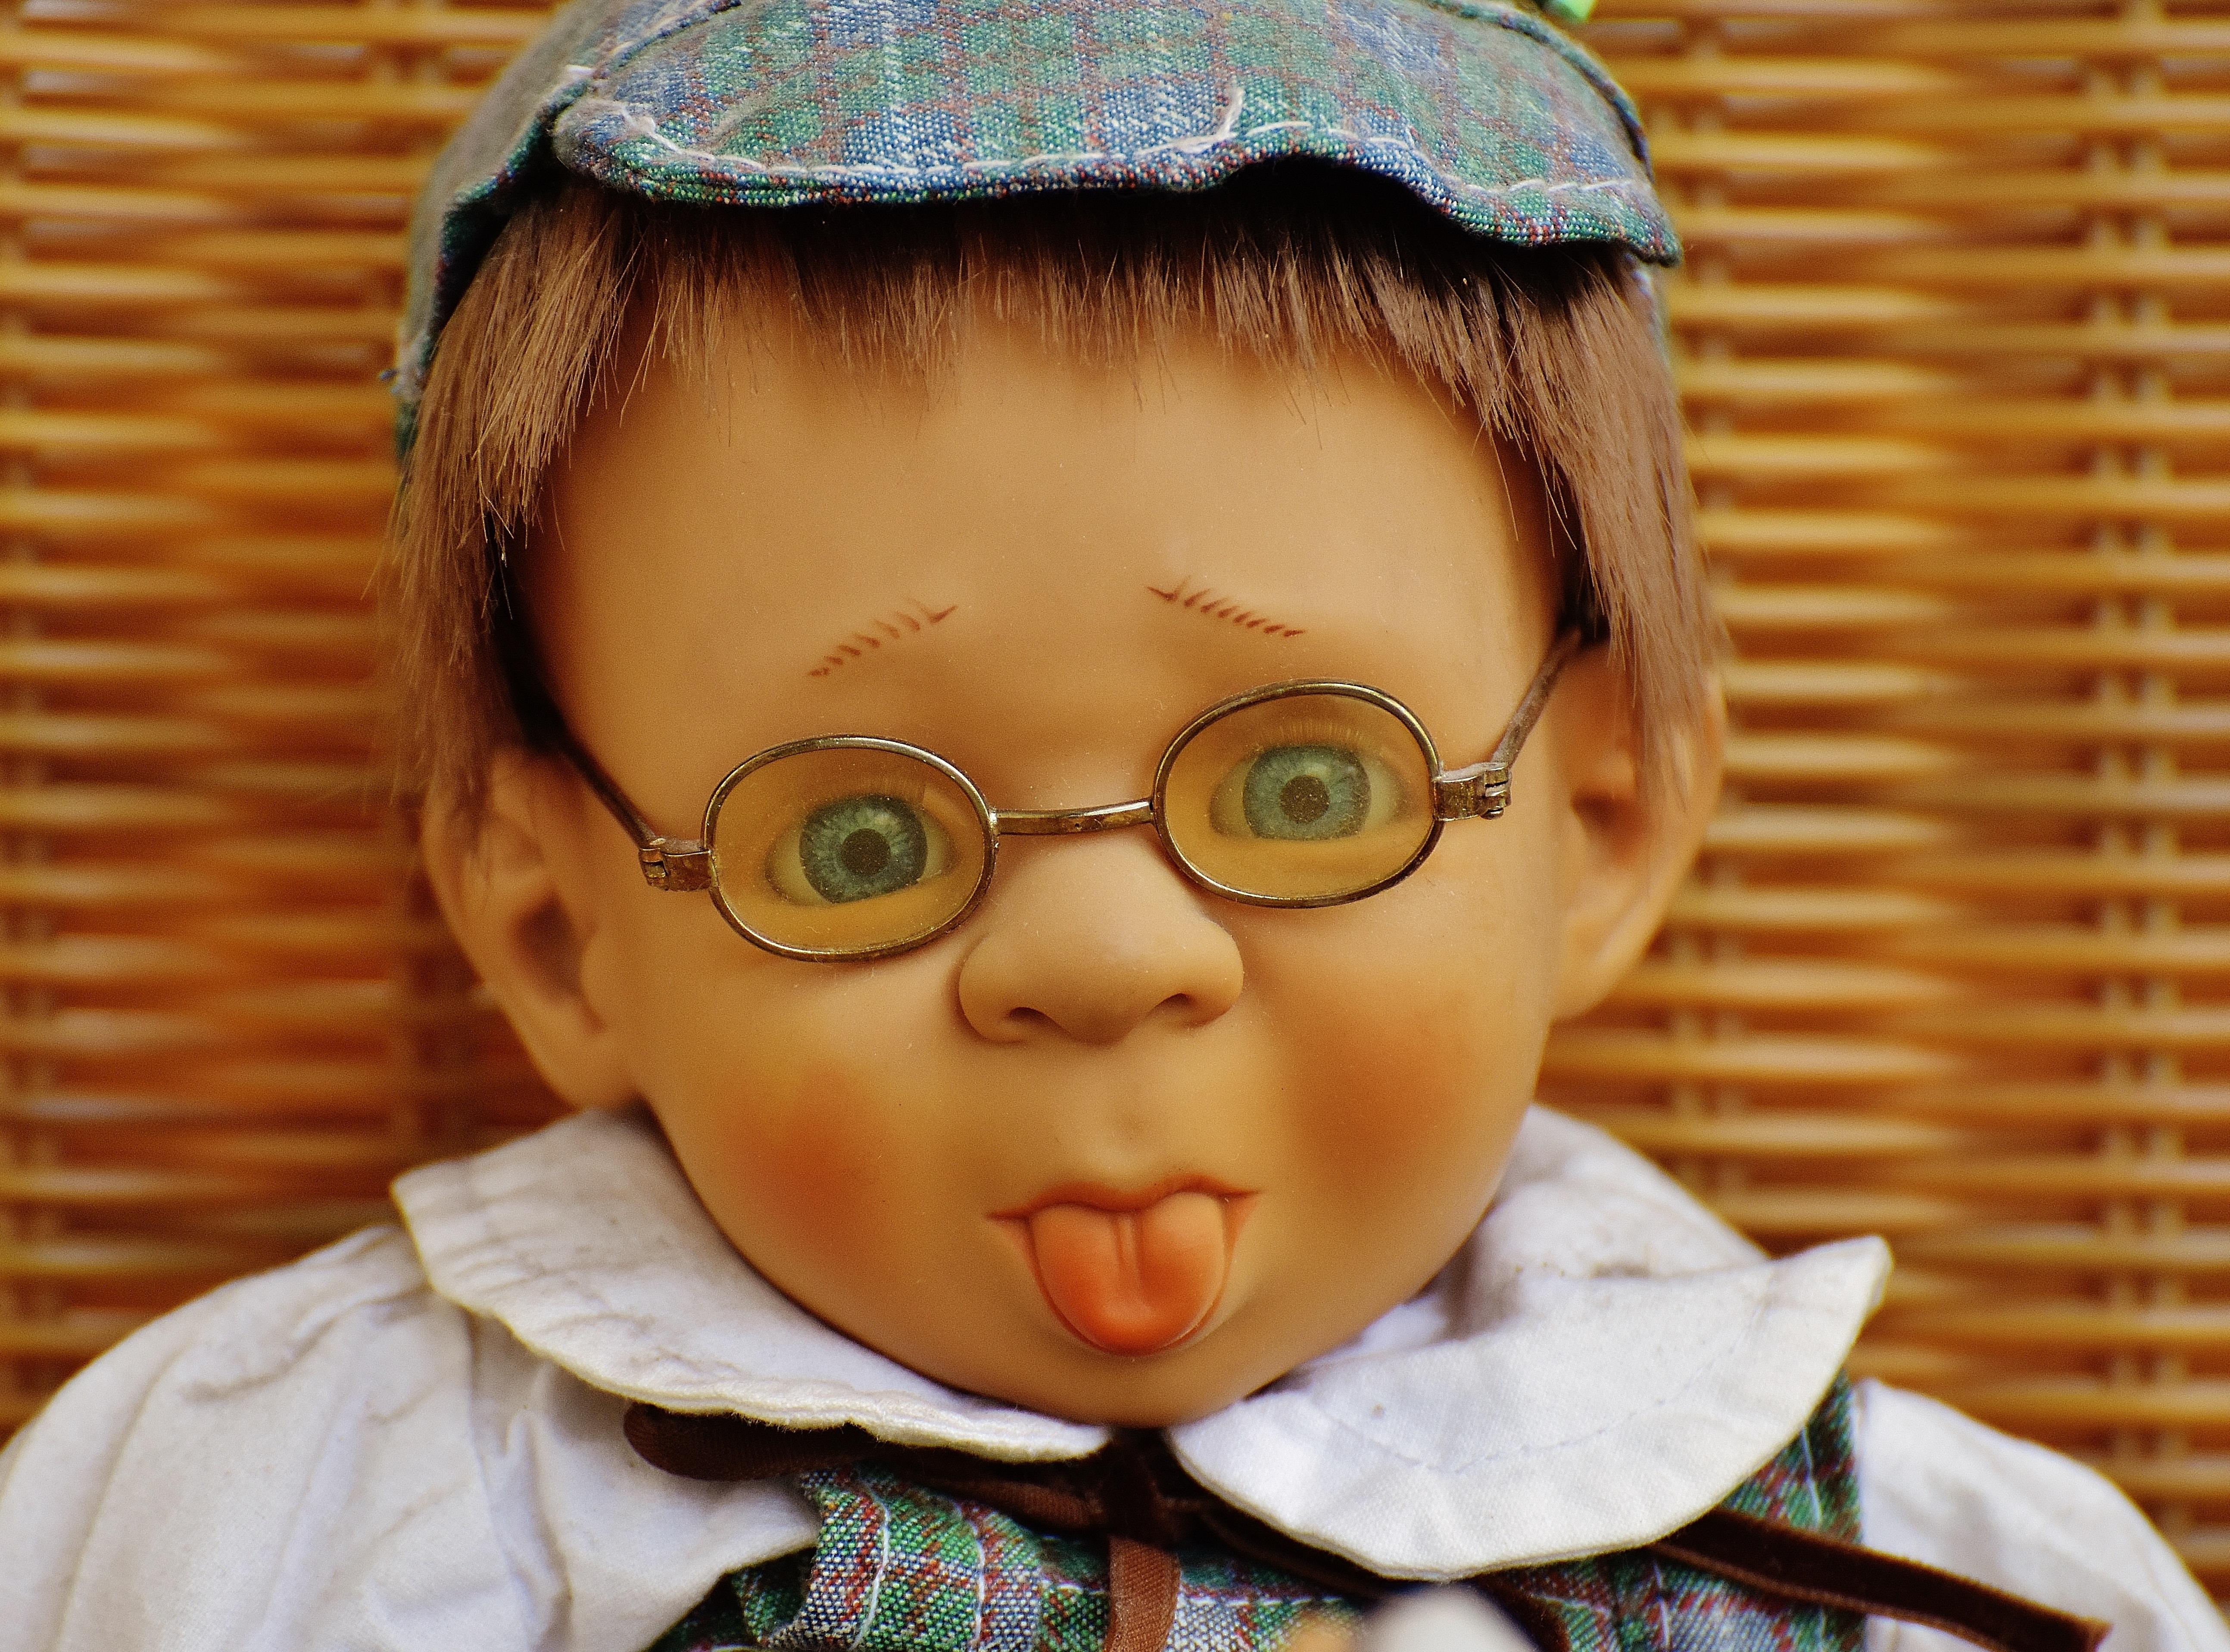 Doll Wearing Eyeglasses 183 Free Stock Photo